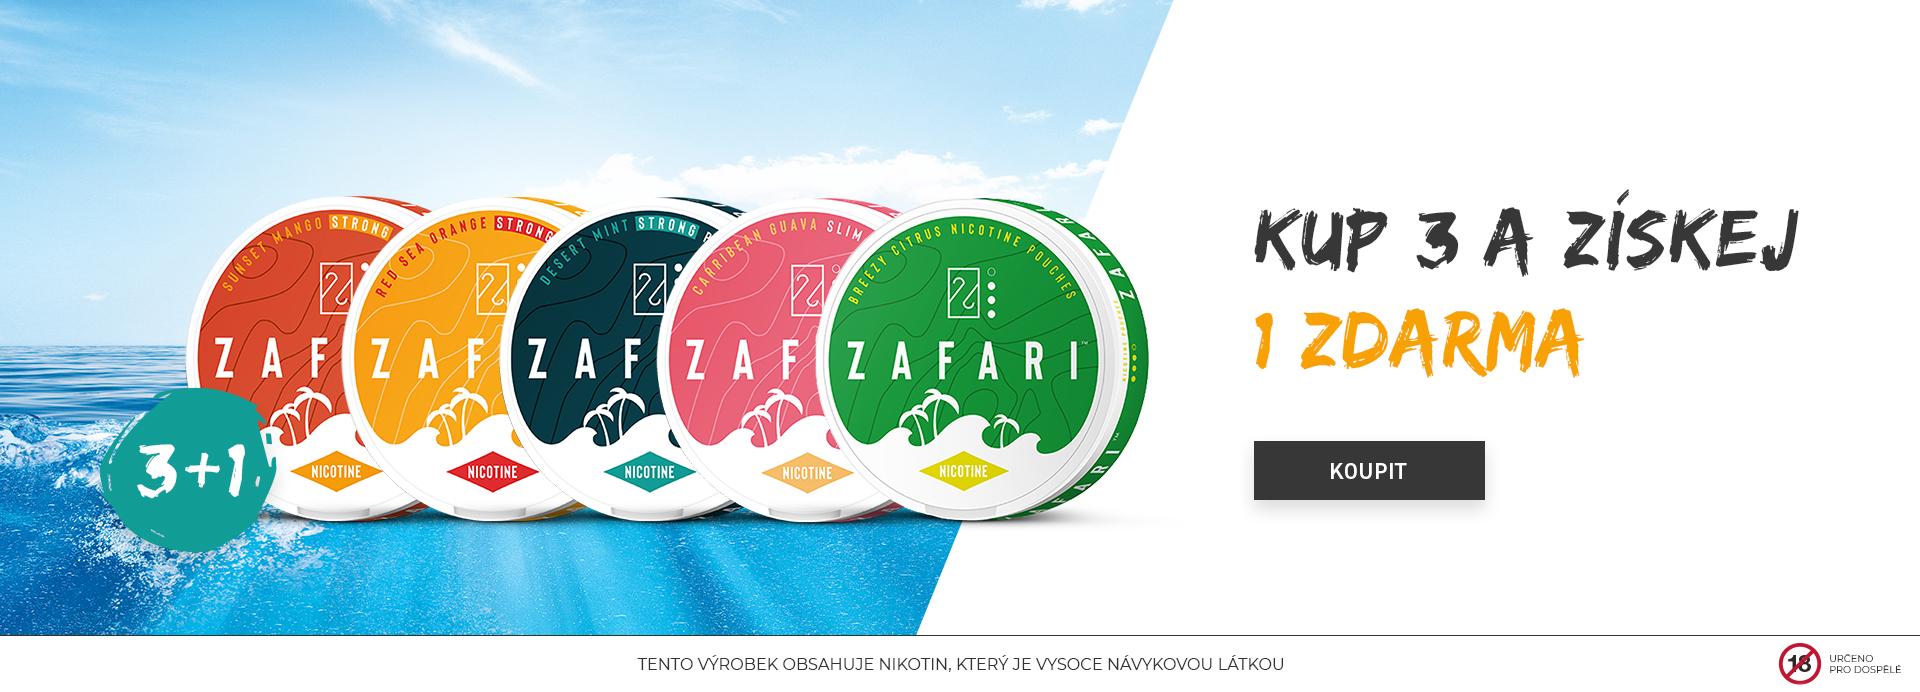 ZAFARI 3+1 zdarma